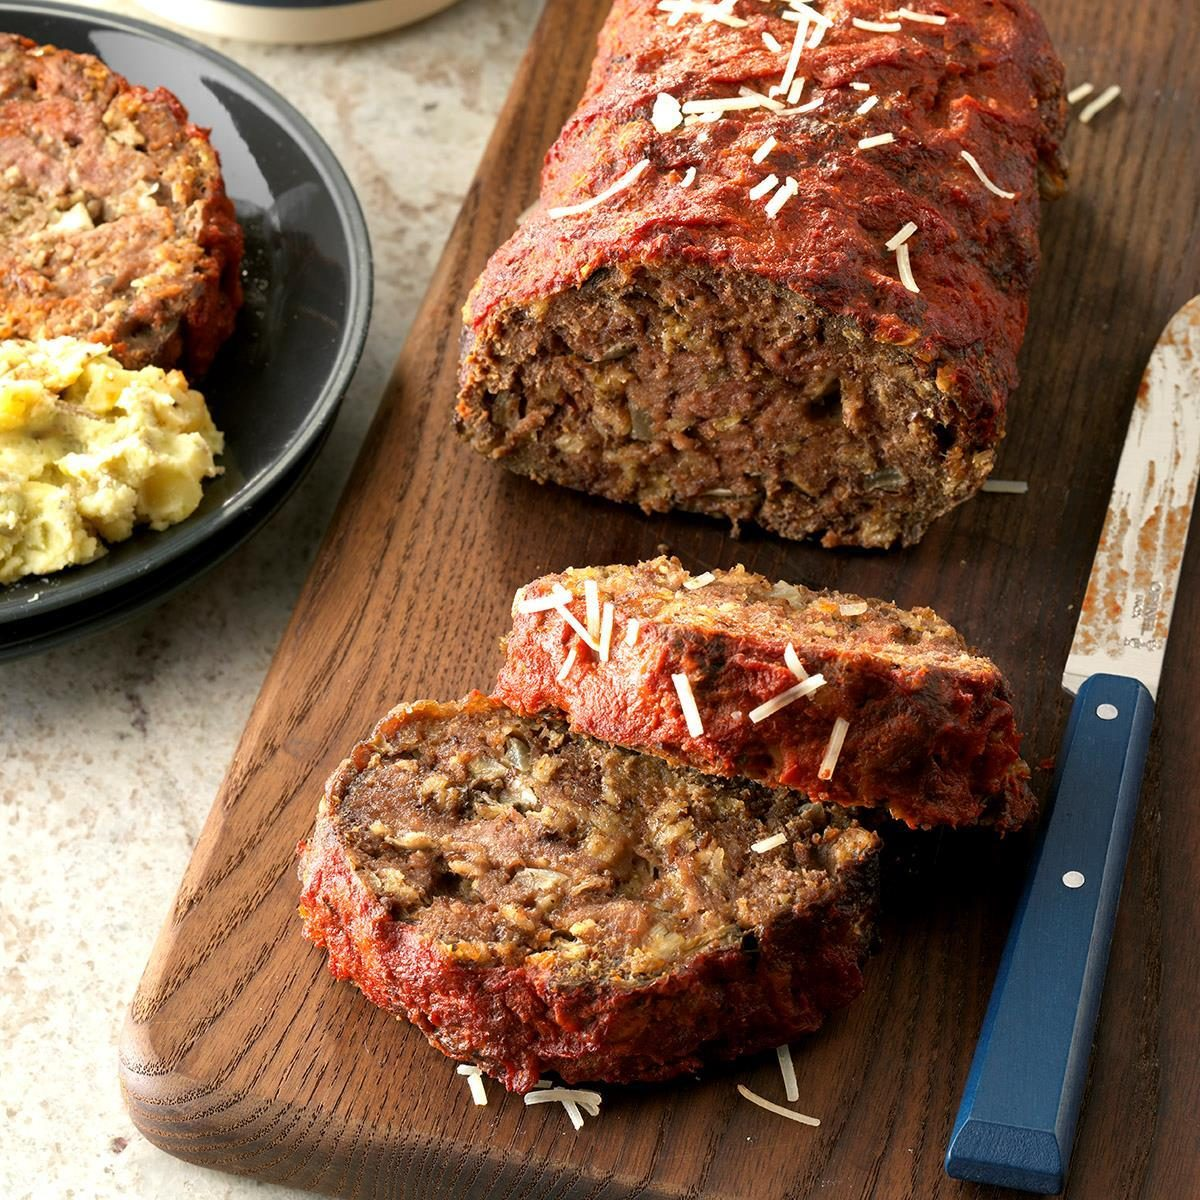 Day 10: Italian Mushroom Meat Loaf